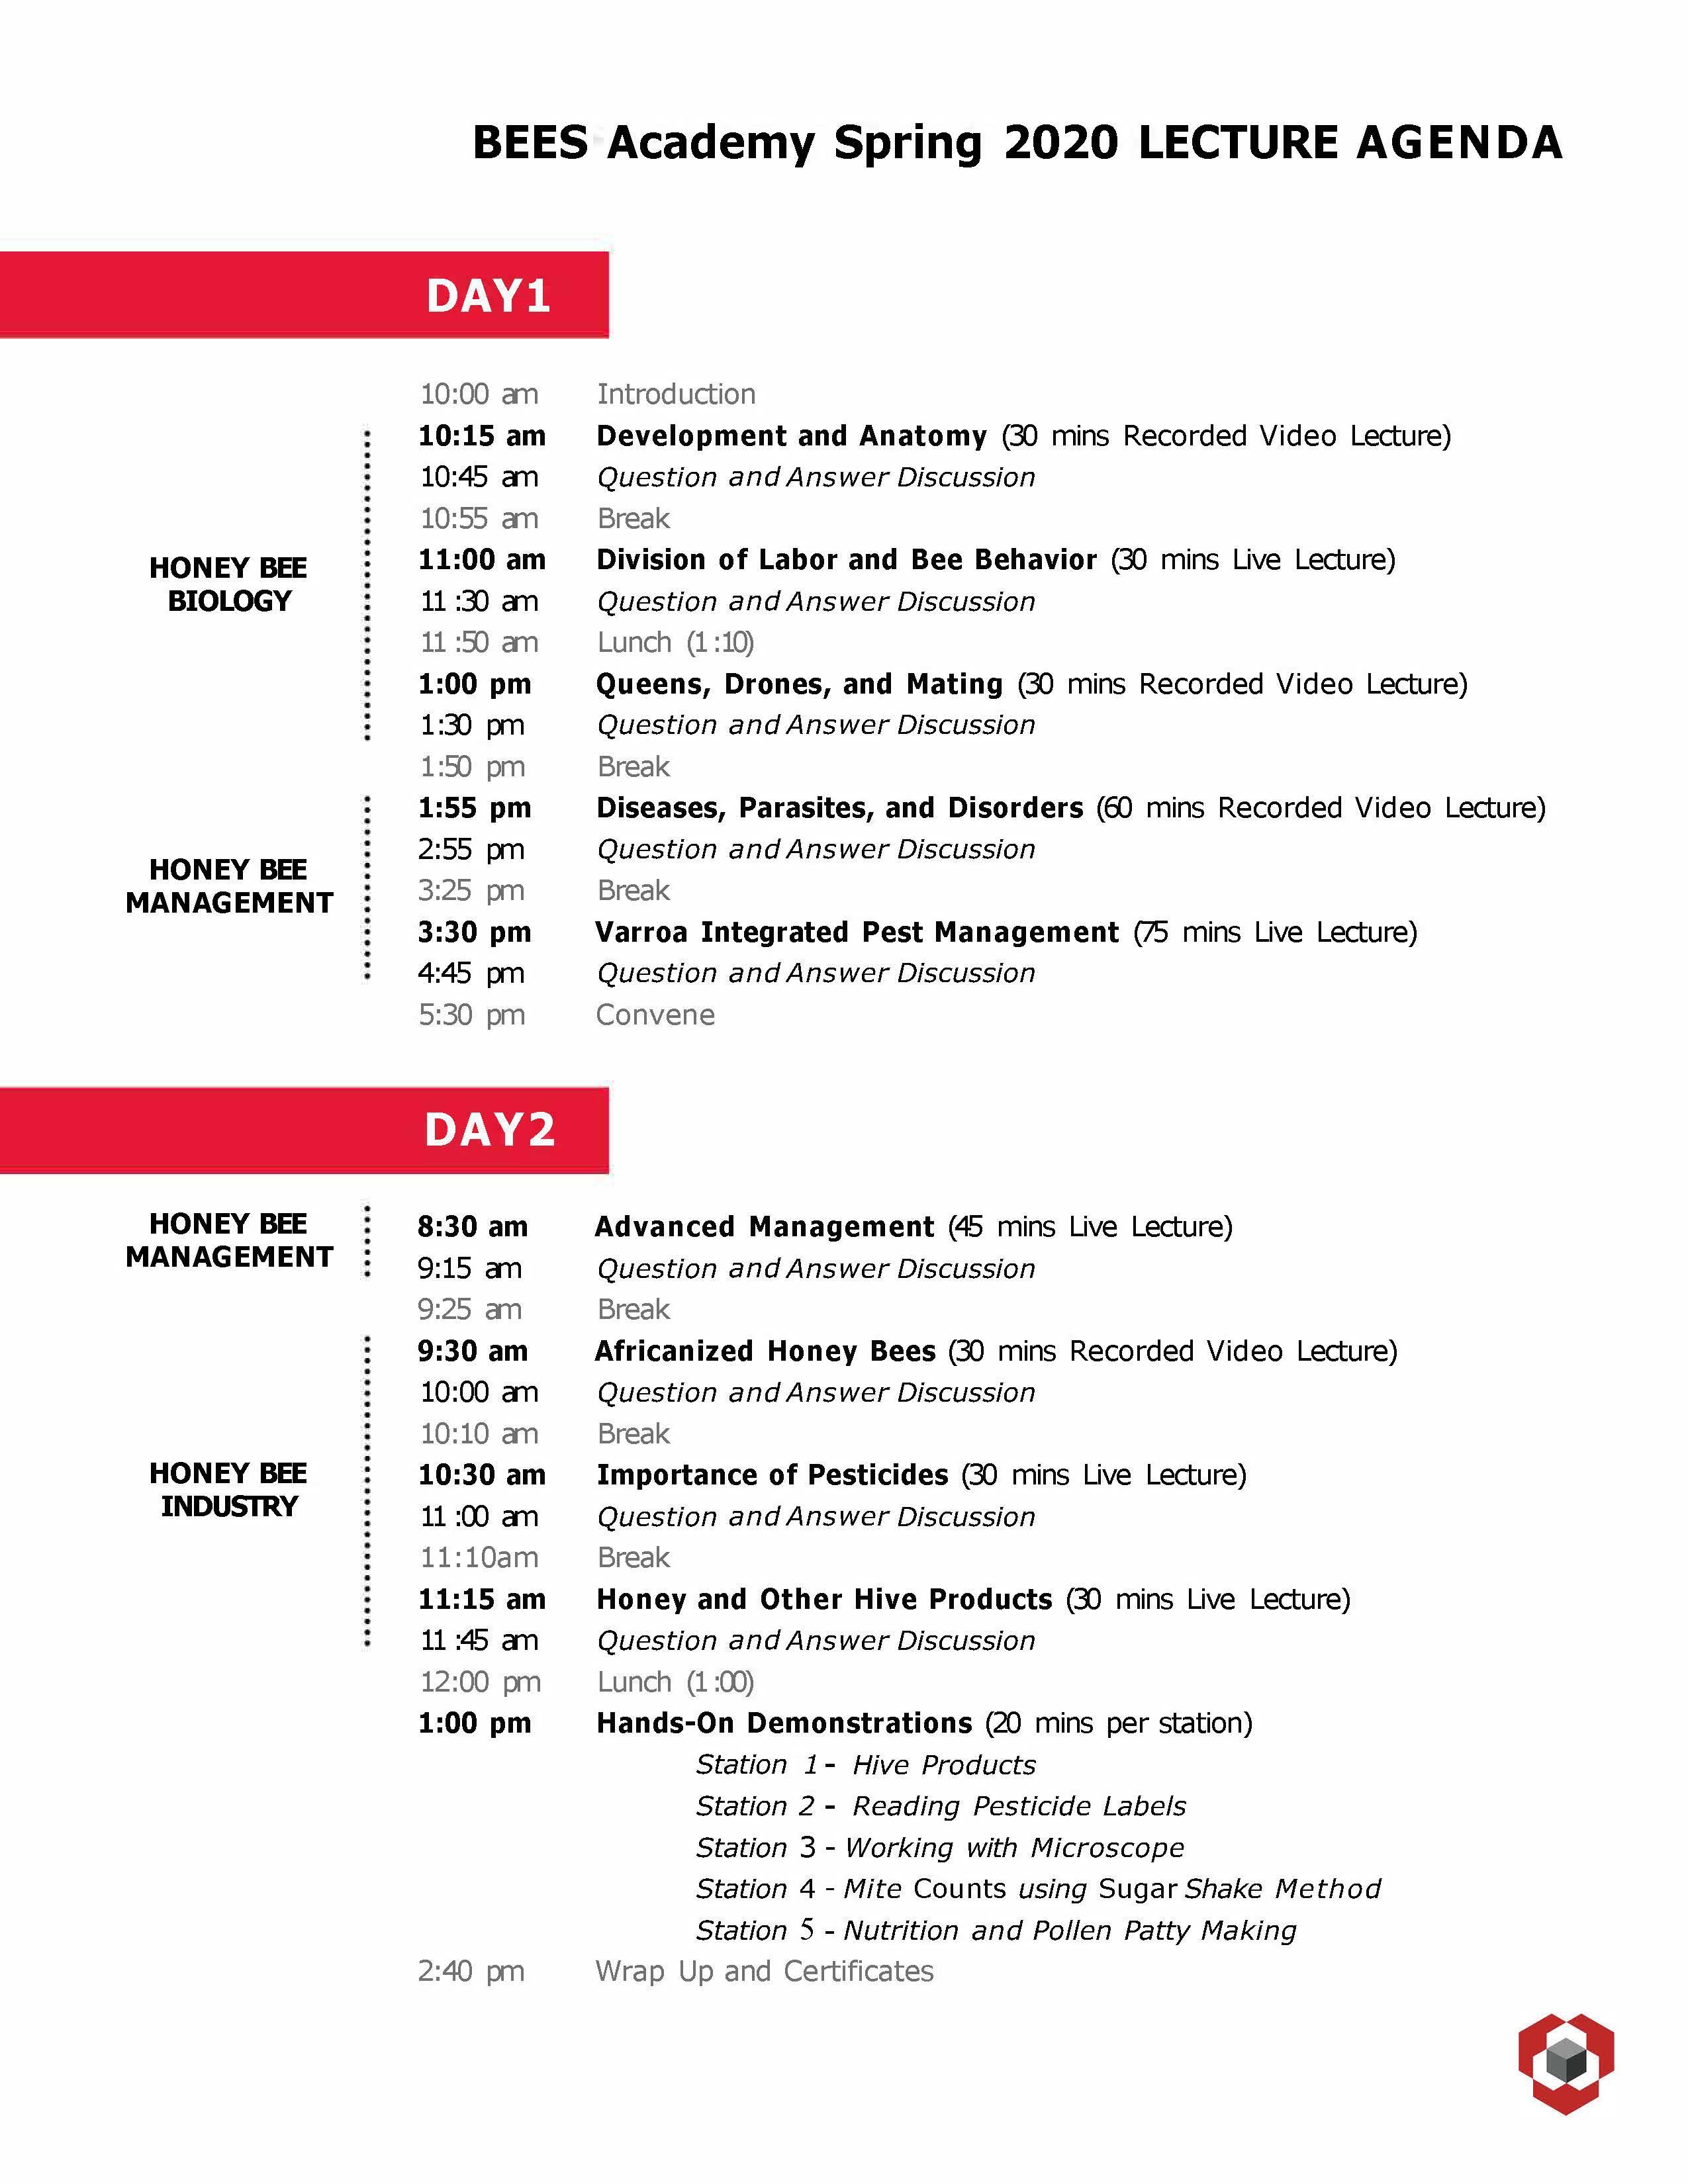 BEES Academy agenda flyer image